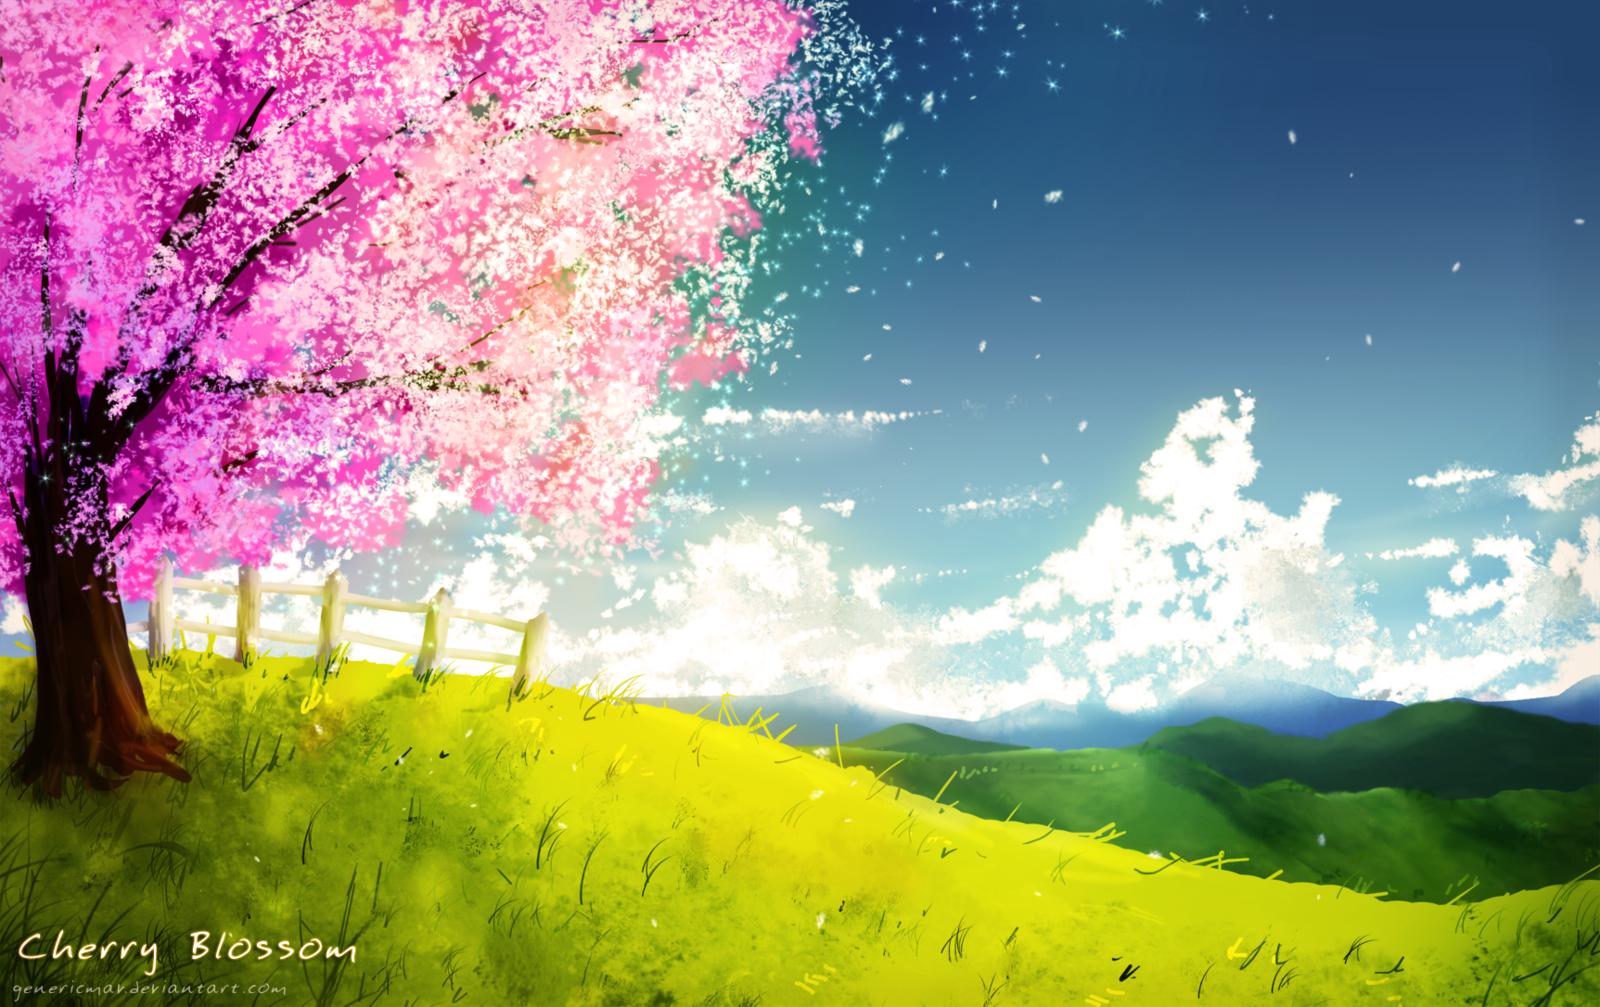 Drawn sakura blossom landscape By by Cherry GenericMav Blossom